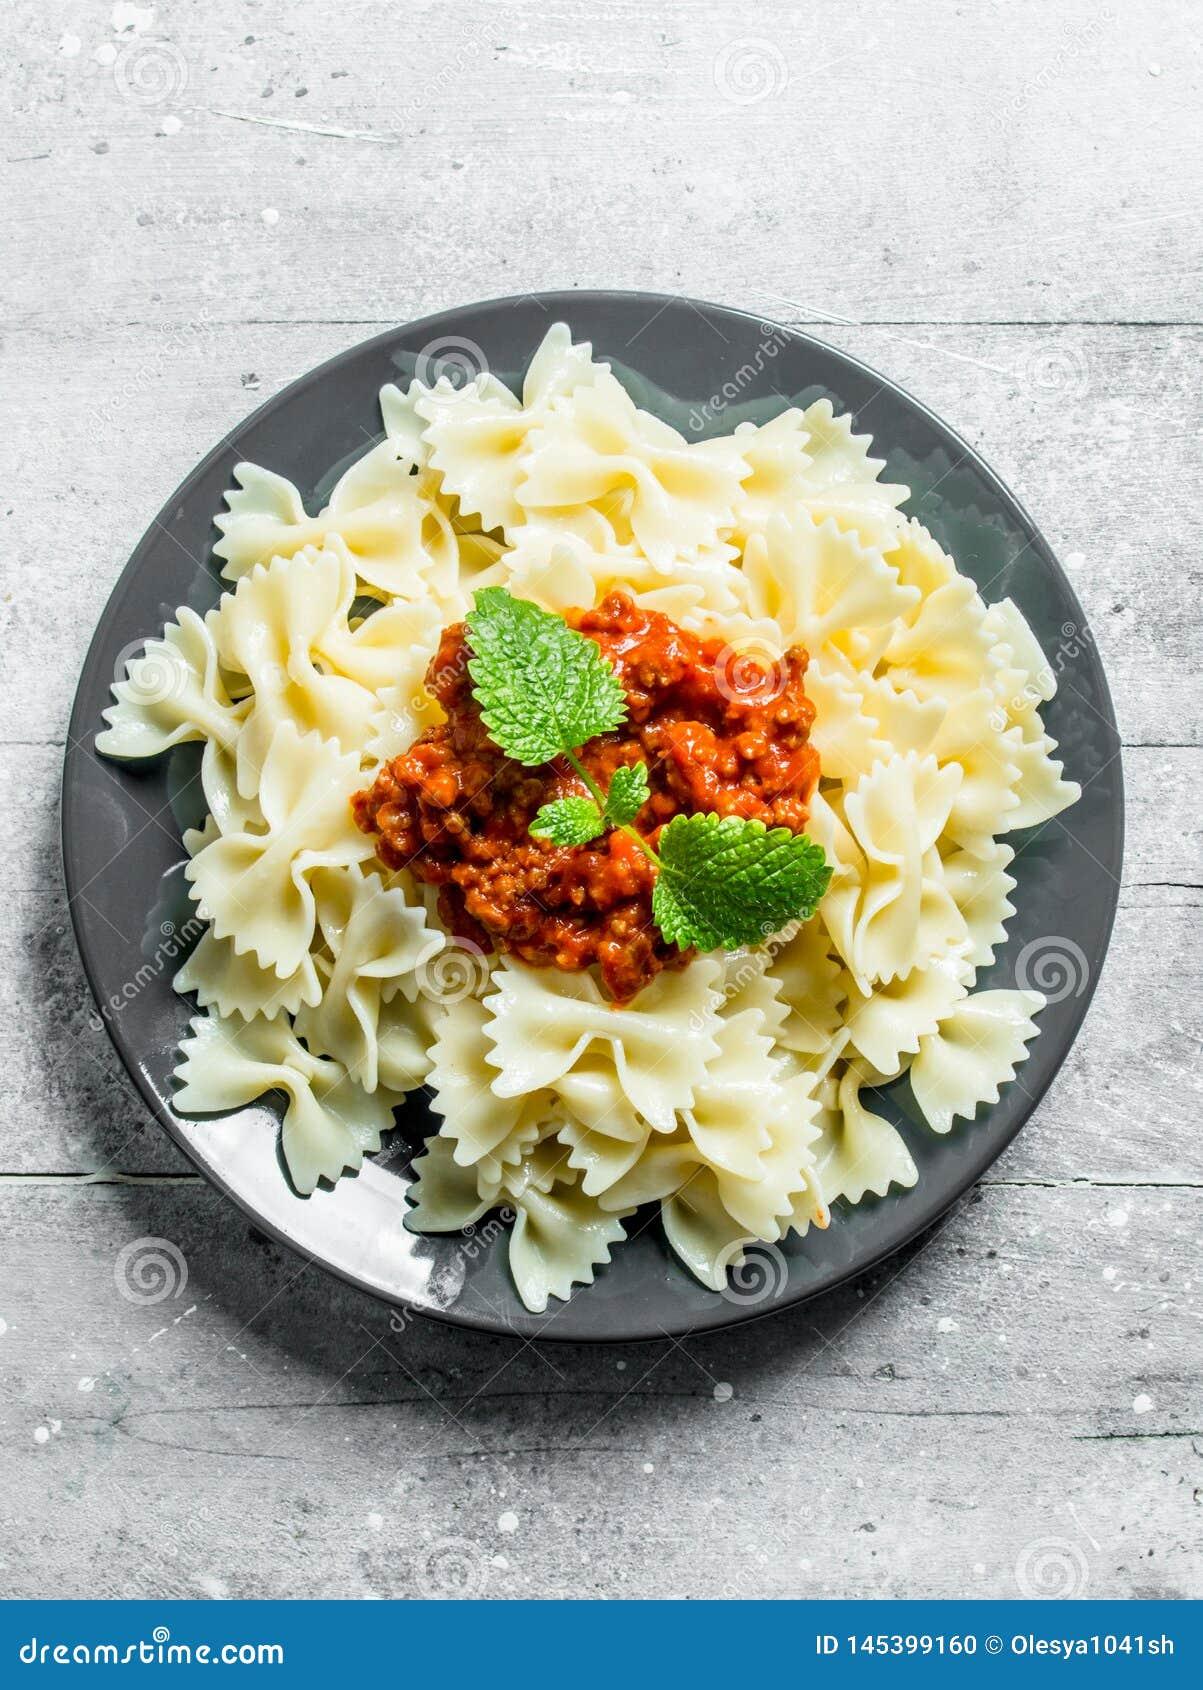 Farfalledeegwaren met Bolognese saus en muntbladeren